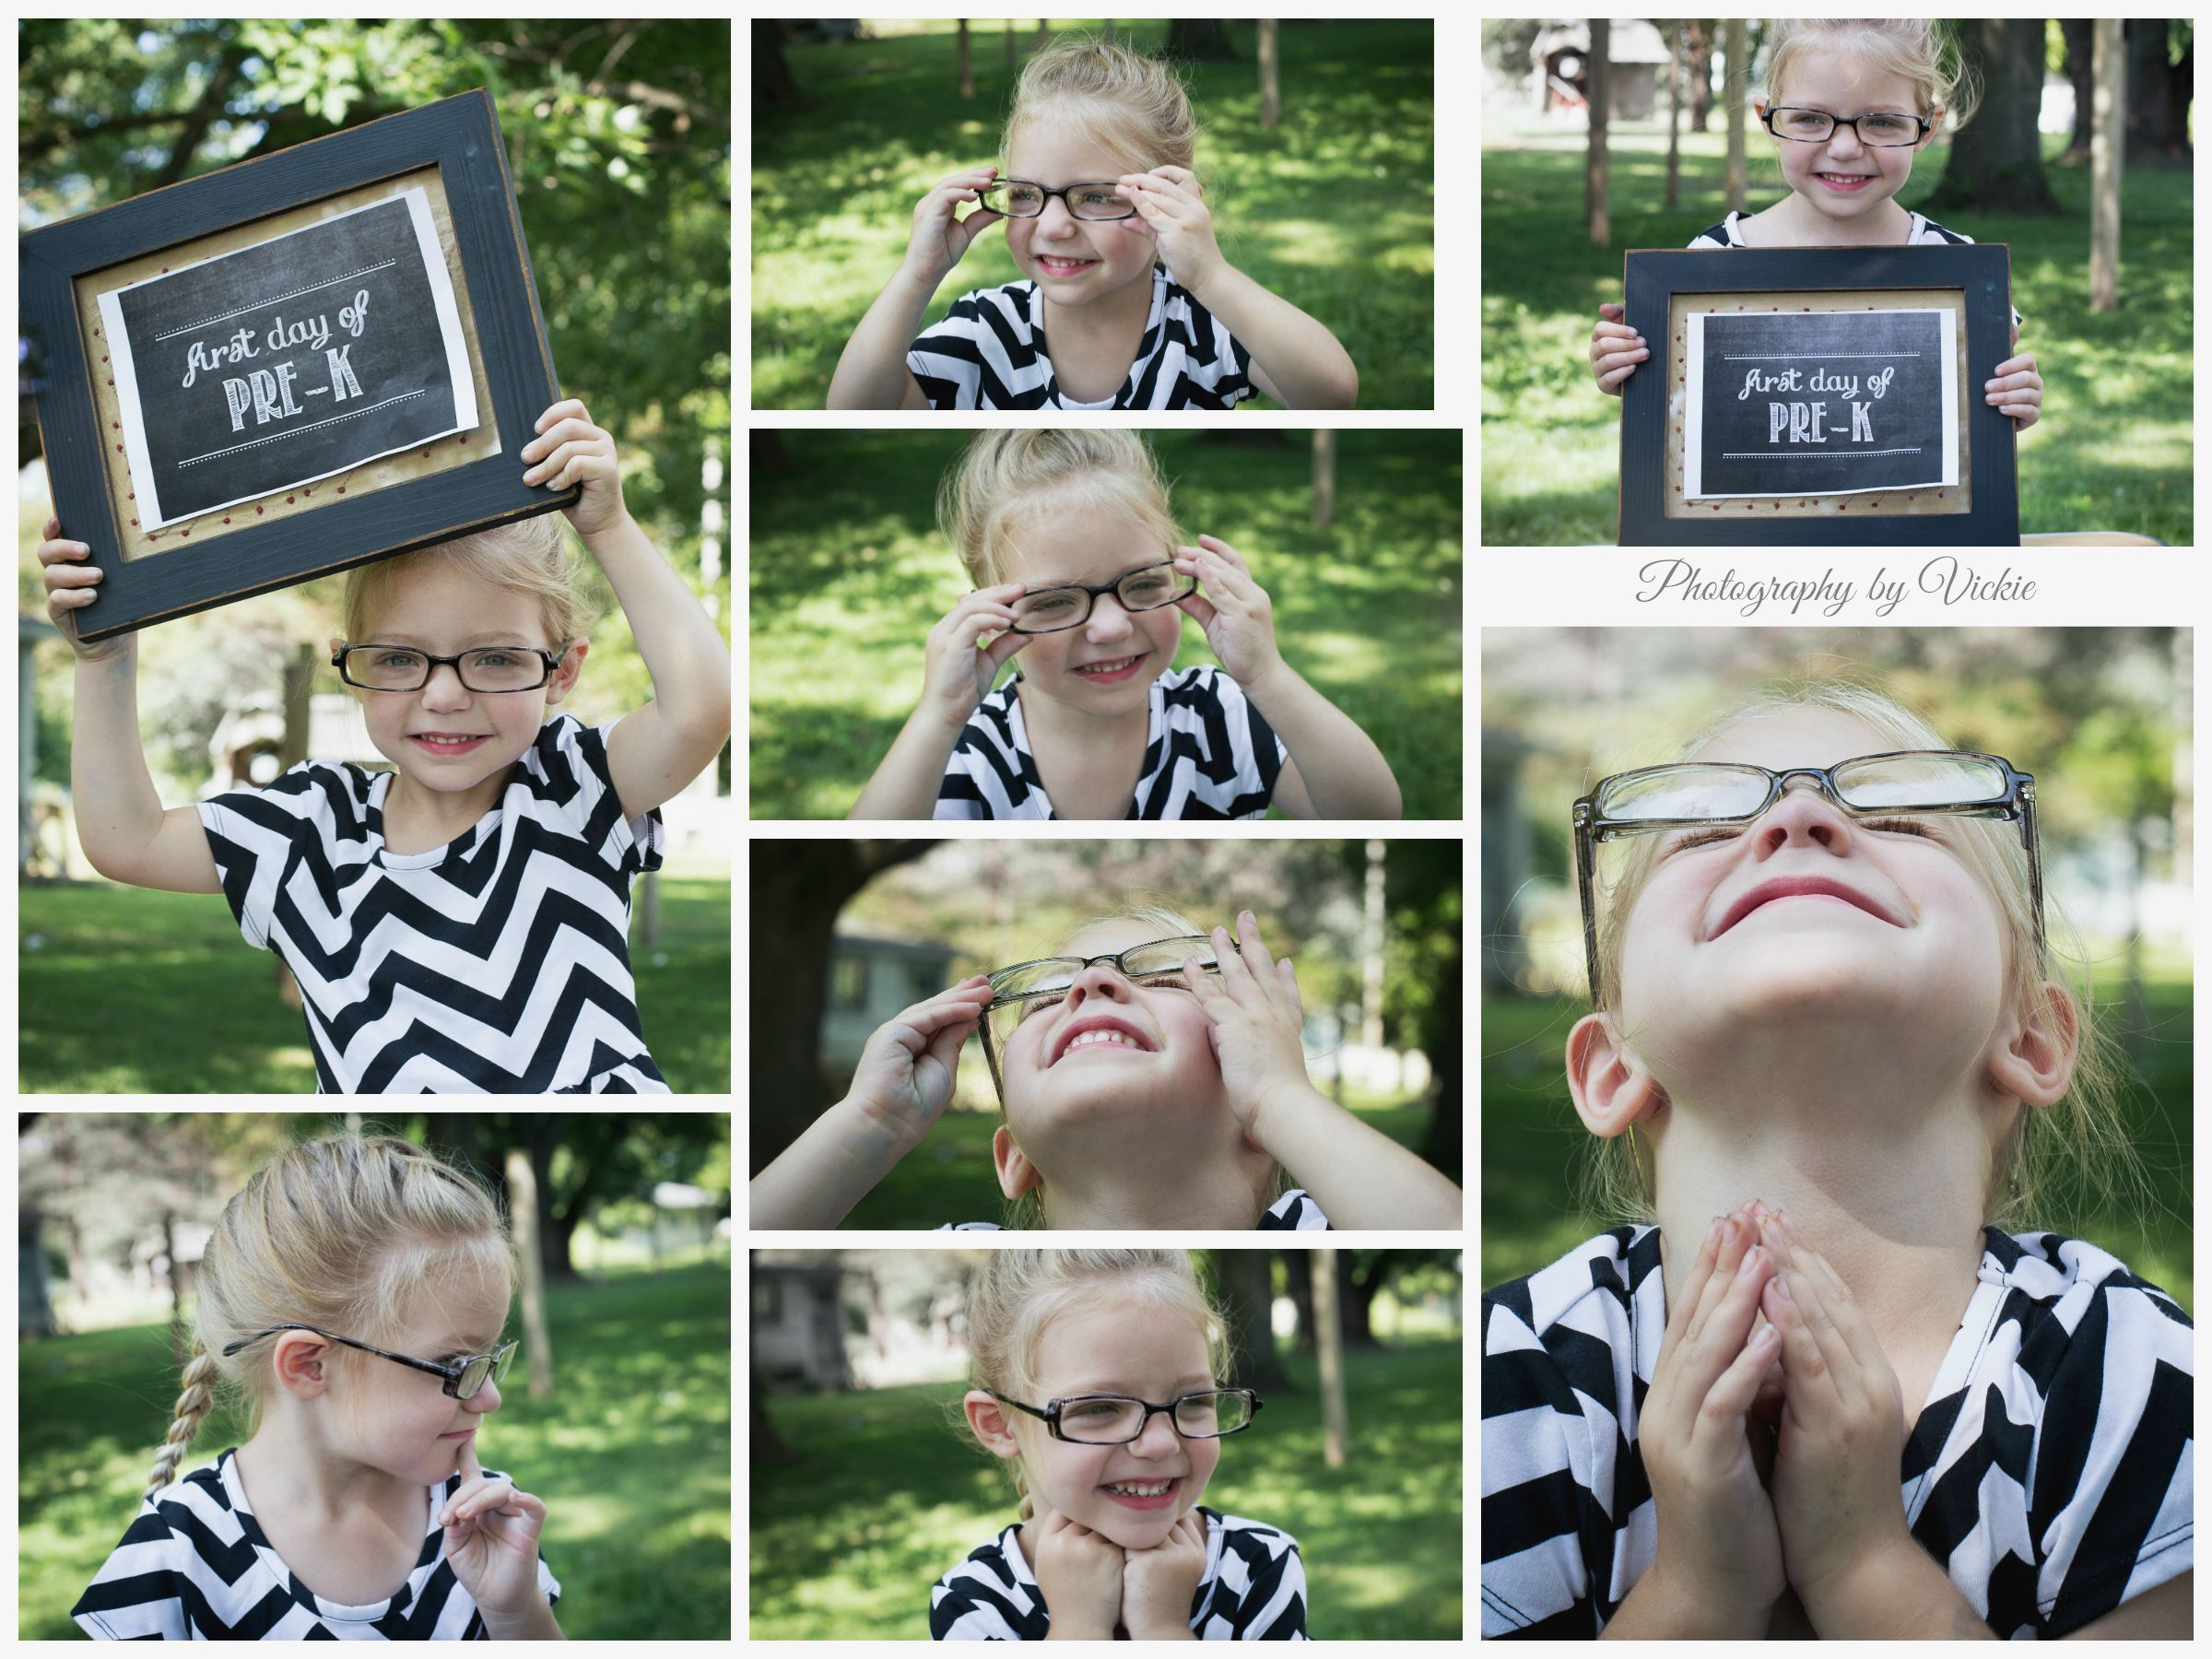 #backtoschoolcoolpics #photographybyvickie www.photographybyvickie.com